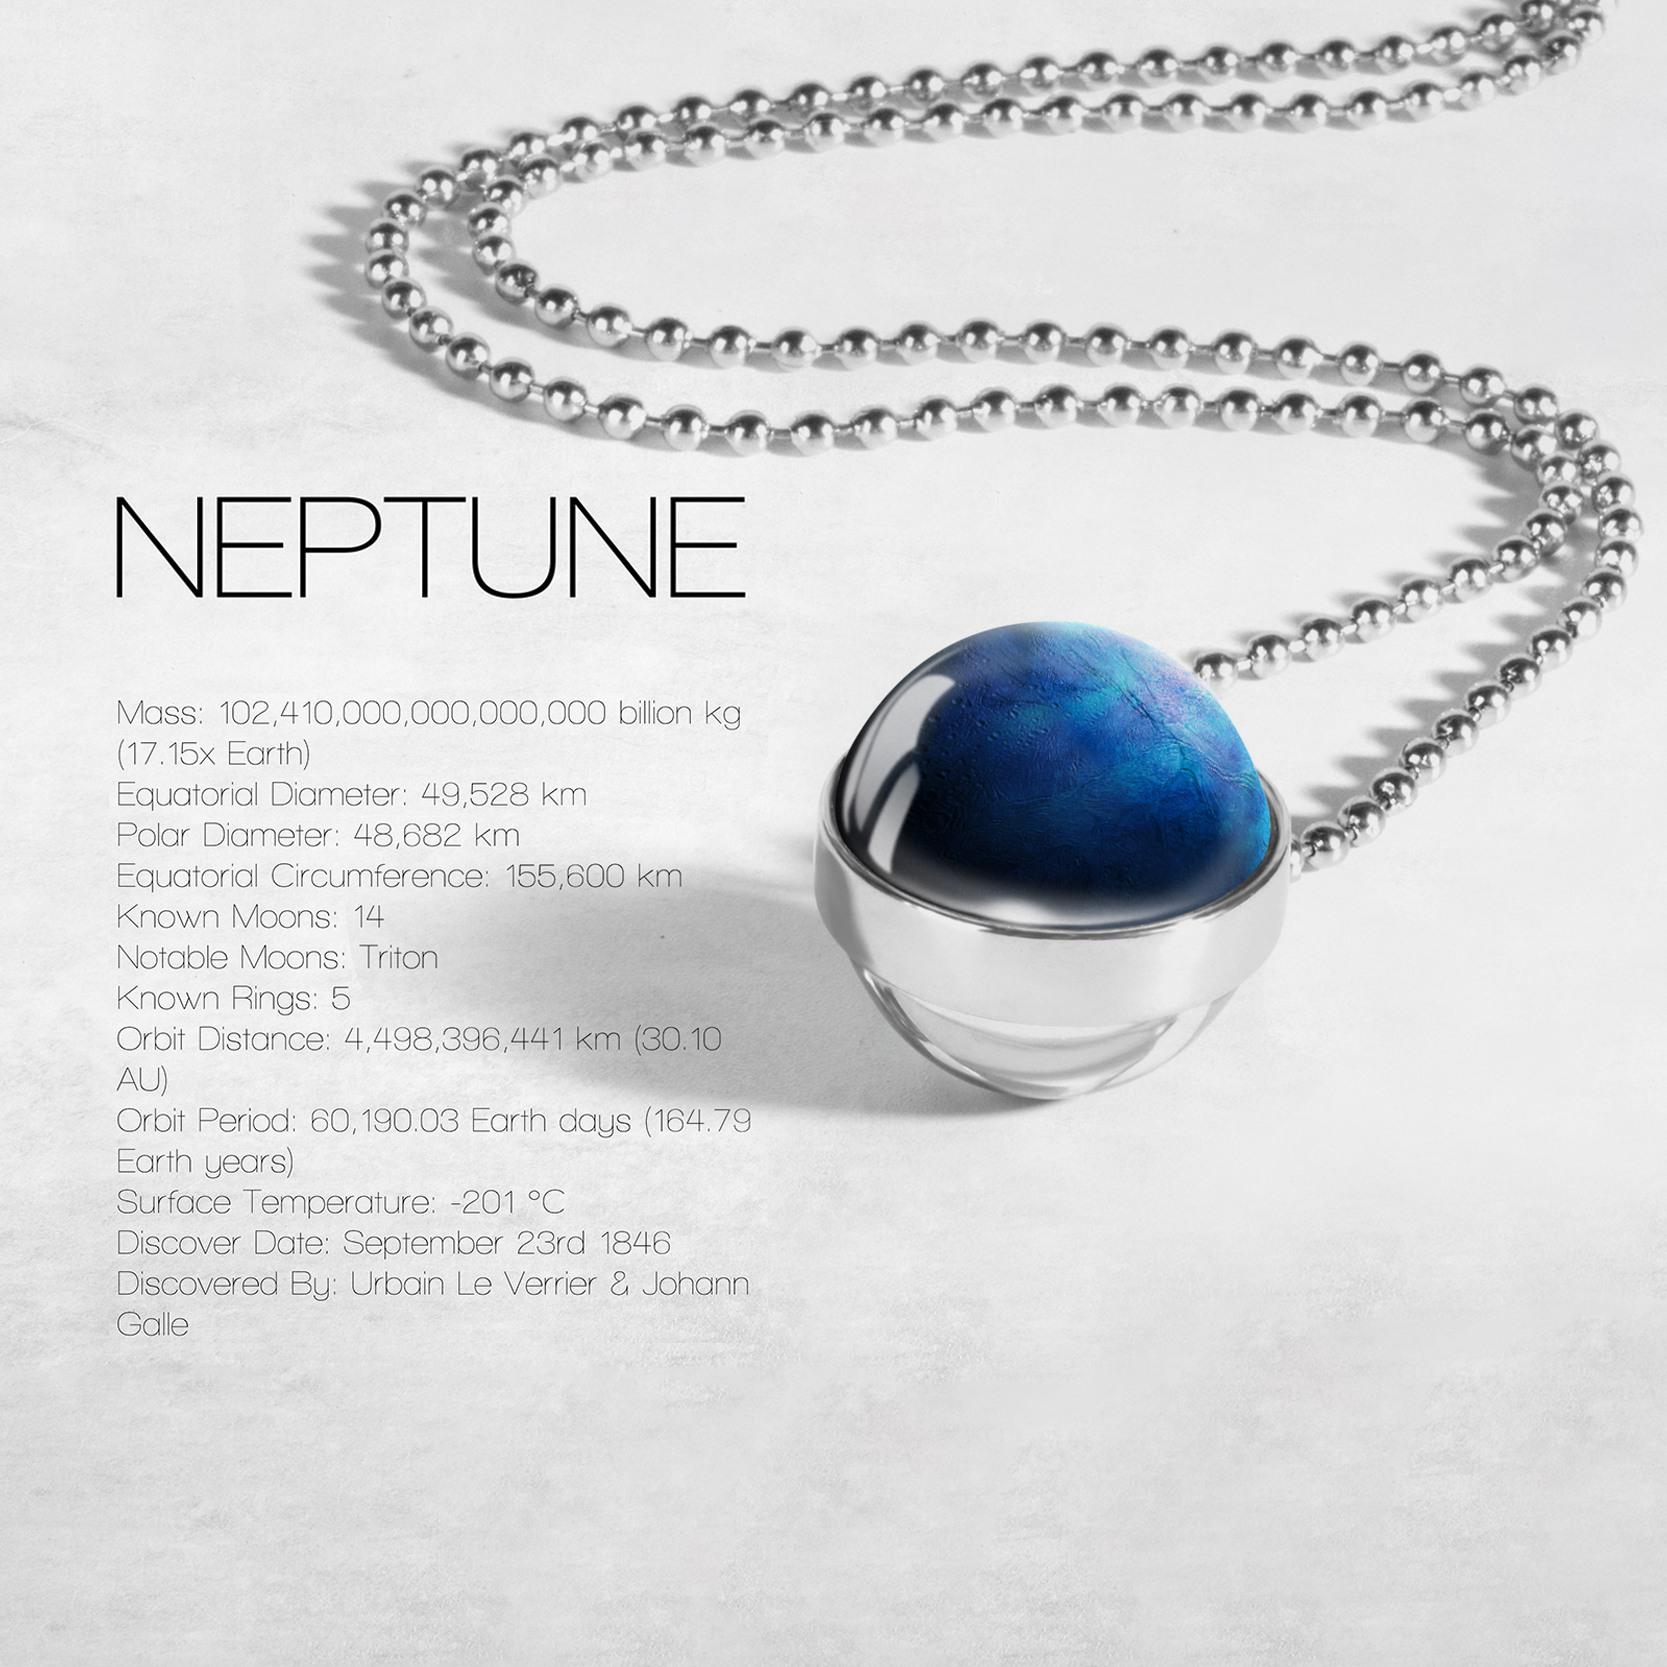 Globe Double Sided Necklace Solar System Planet Venus Mercury Mars Saturn Uranus Neptune Earth Sun Pendant Dome Glass Necklaces 3